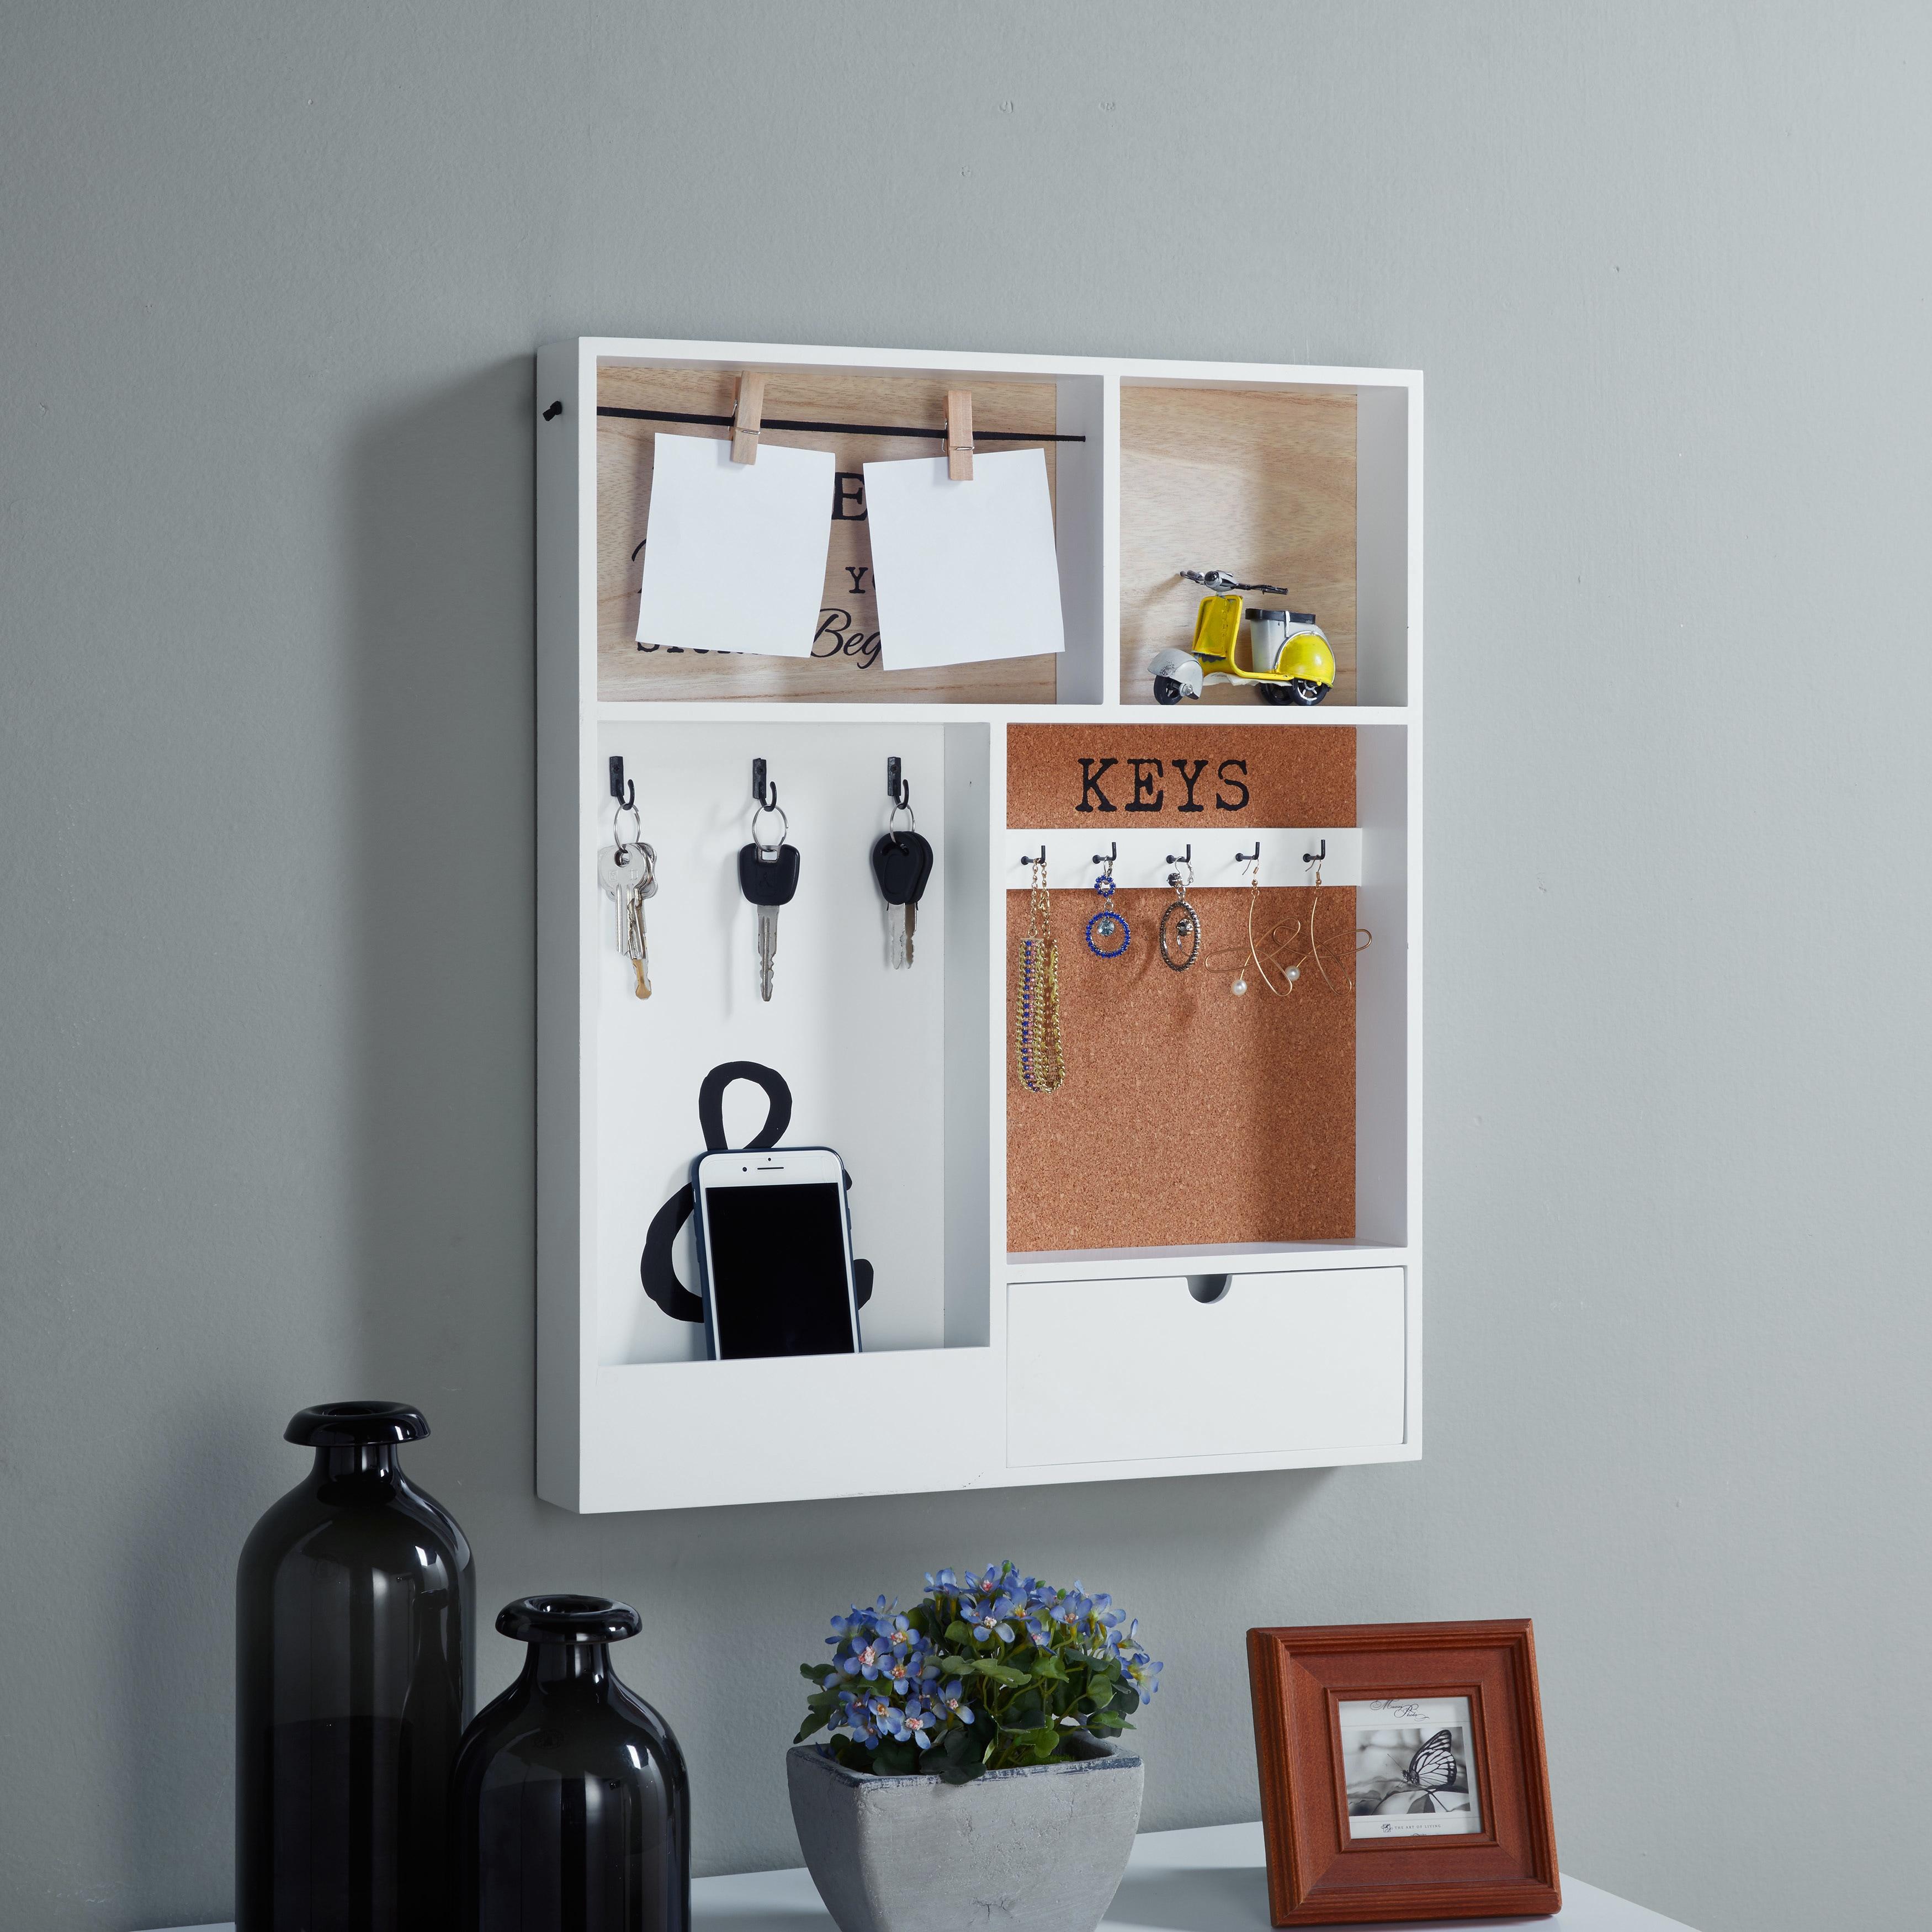 Buy Decorative Storage u0026 Organizers Online at